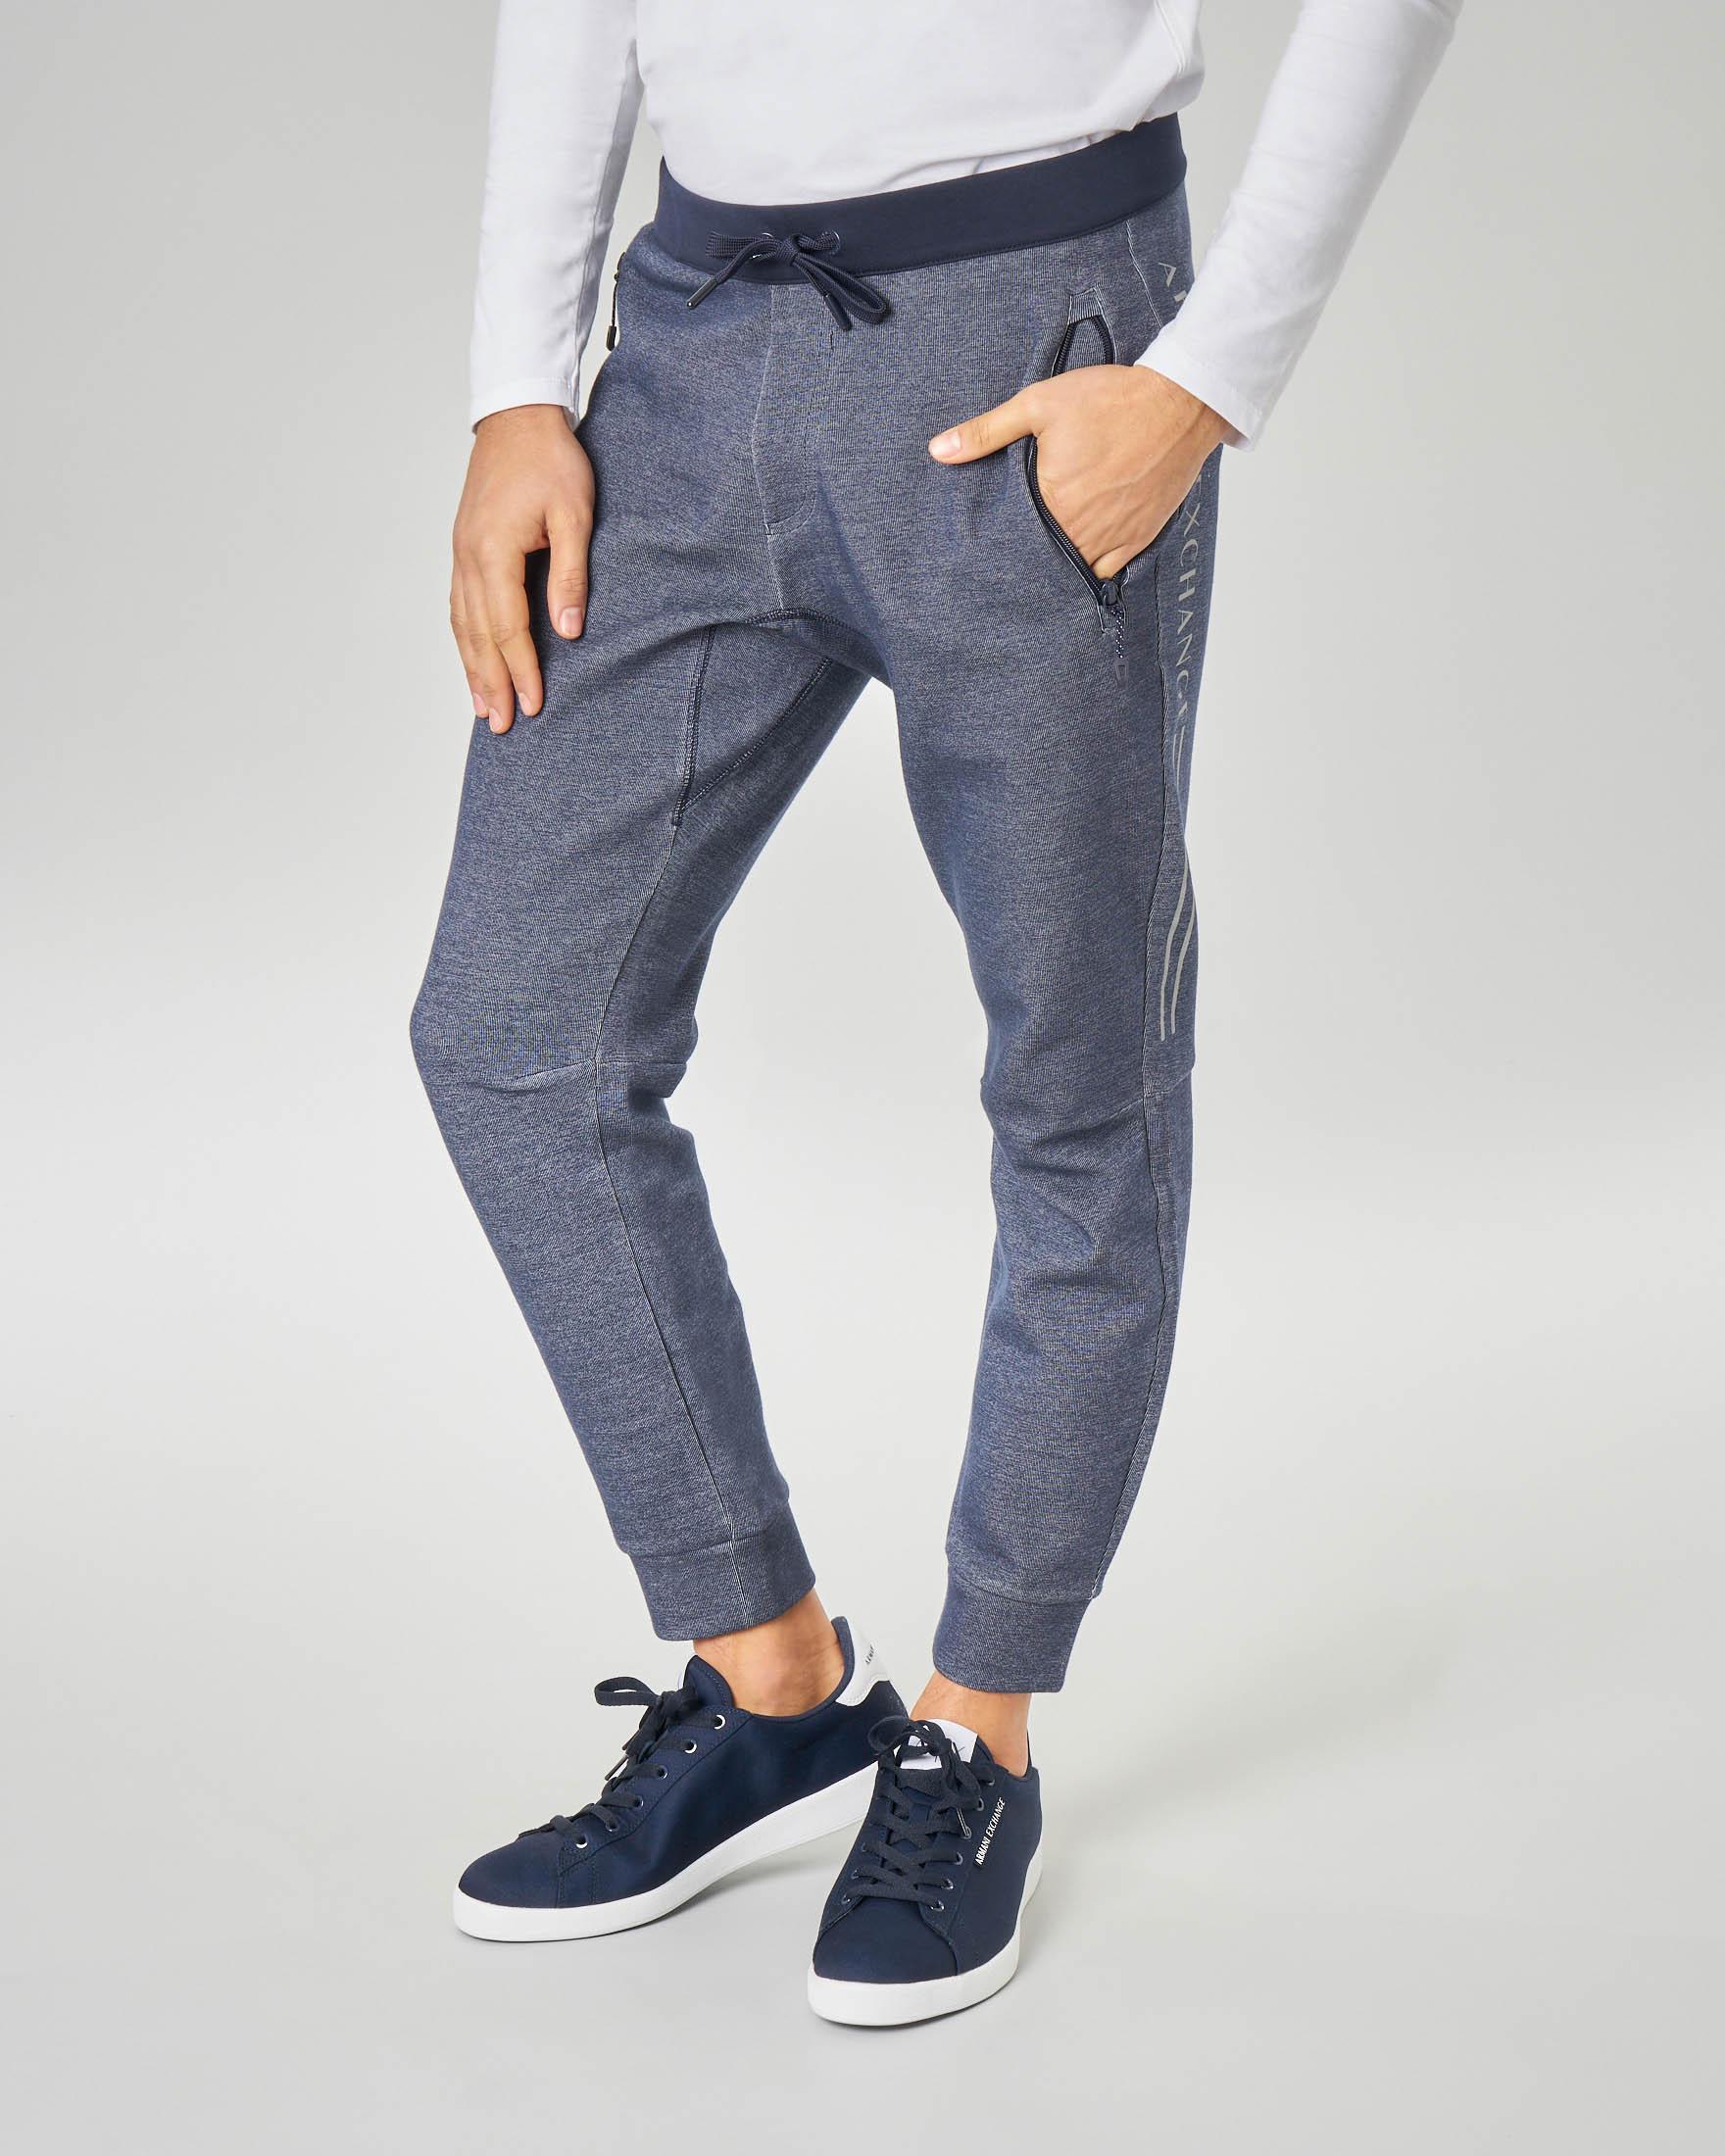 Pantalone Joggers blu melange in felpa